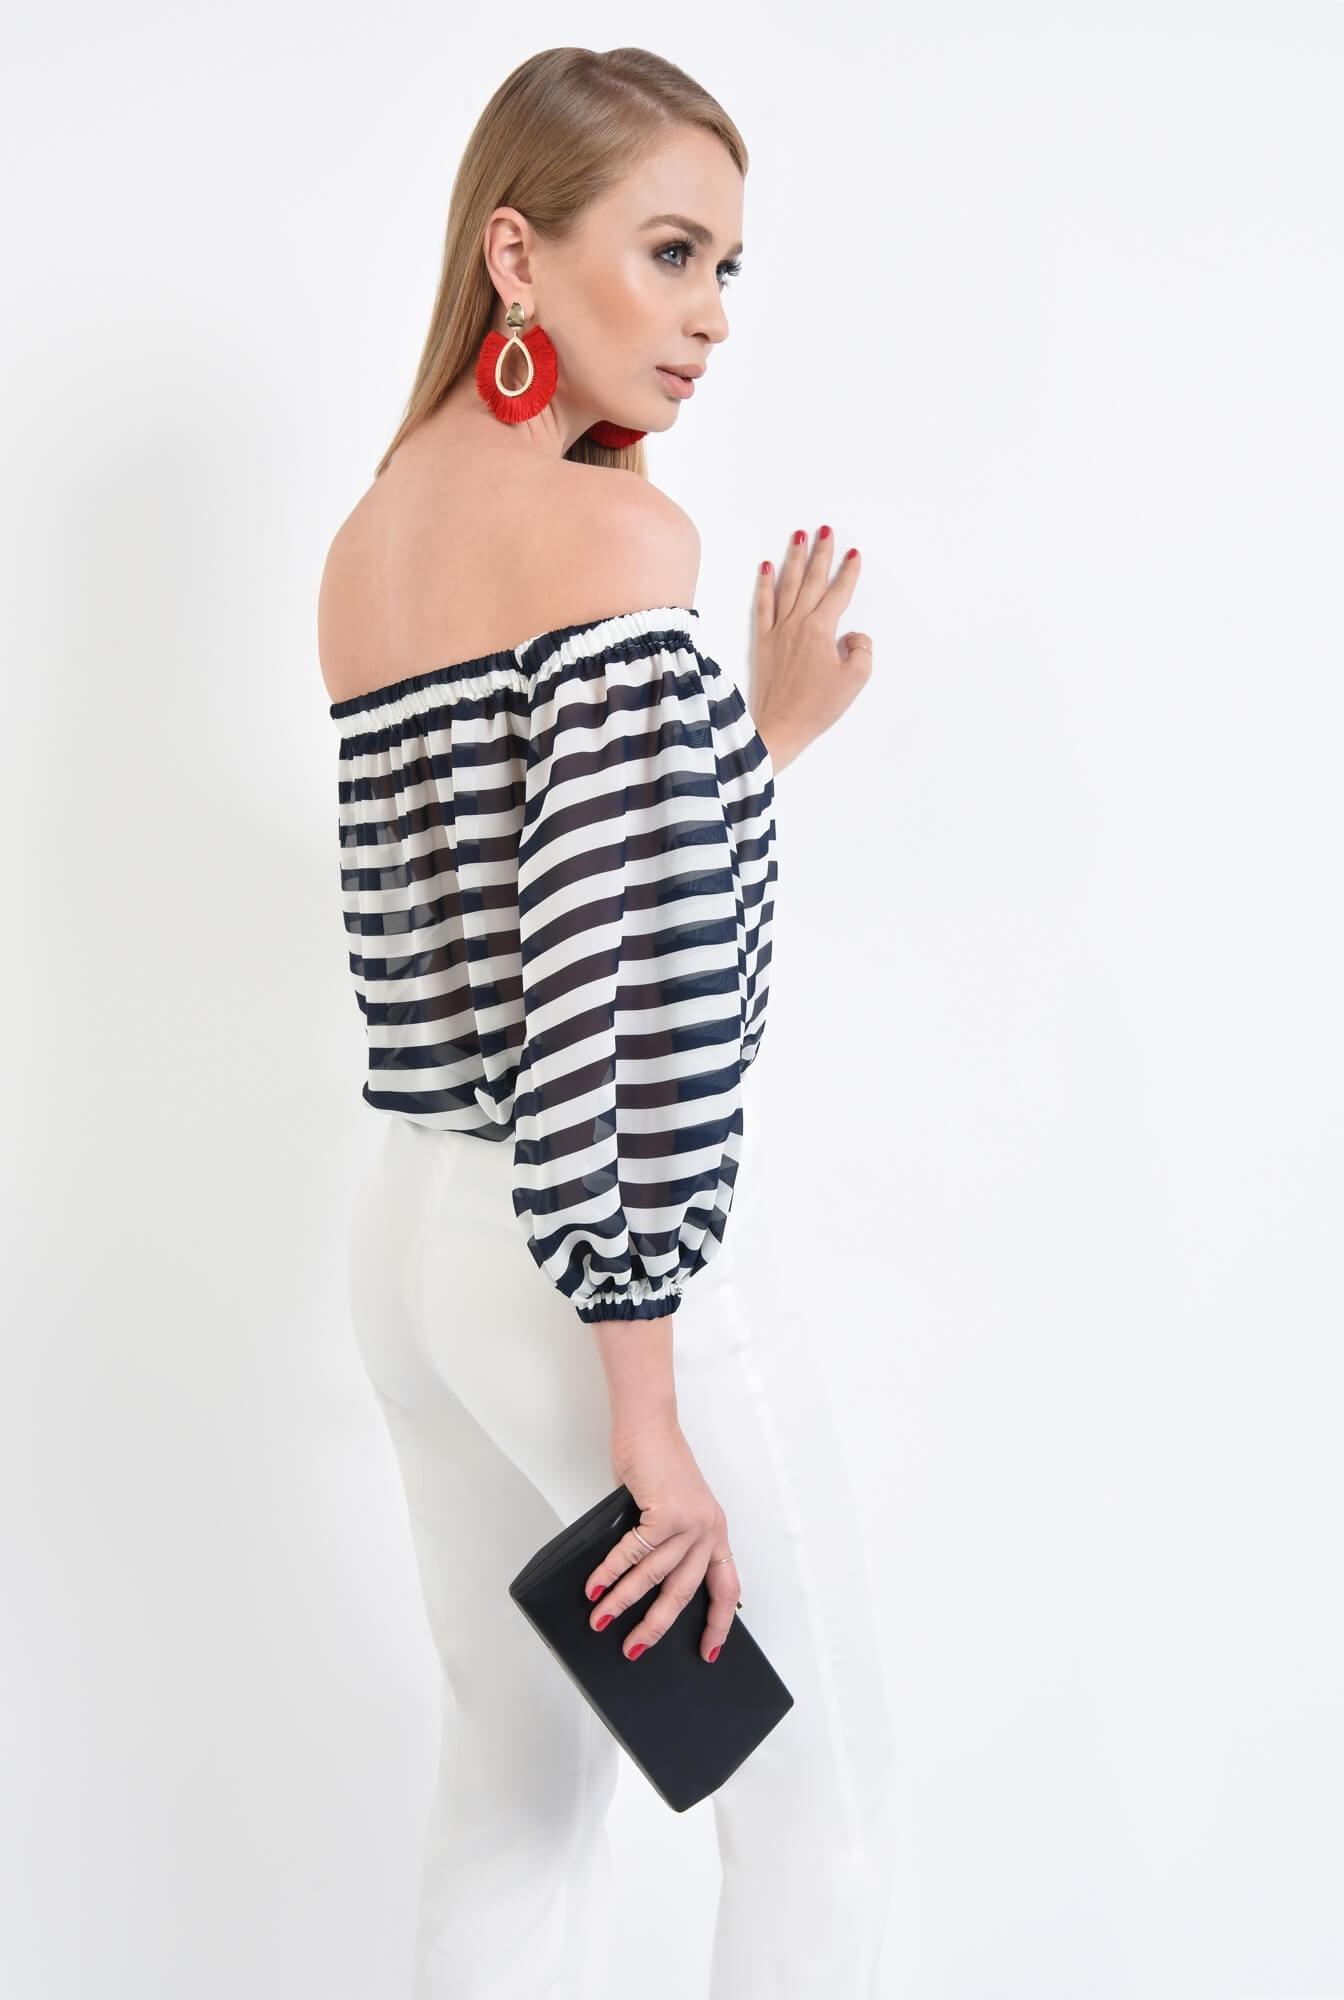 1 - bluza eleganta cu dungi, alb, bleumarin, decolteu elastic, sifon, maneci lungi